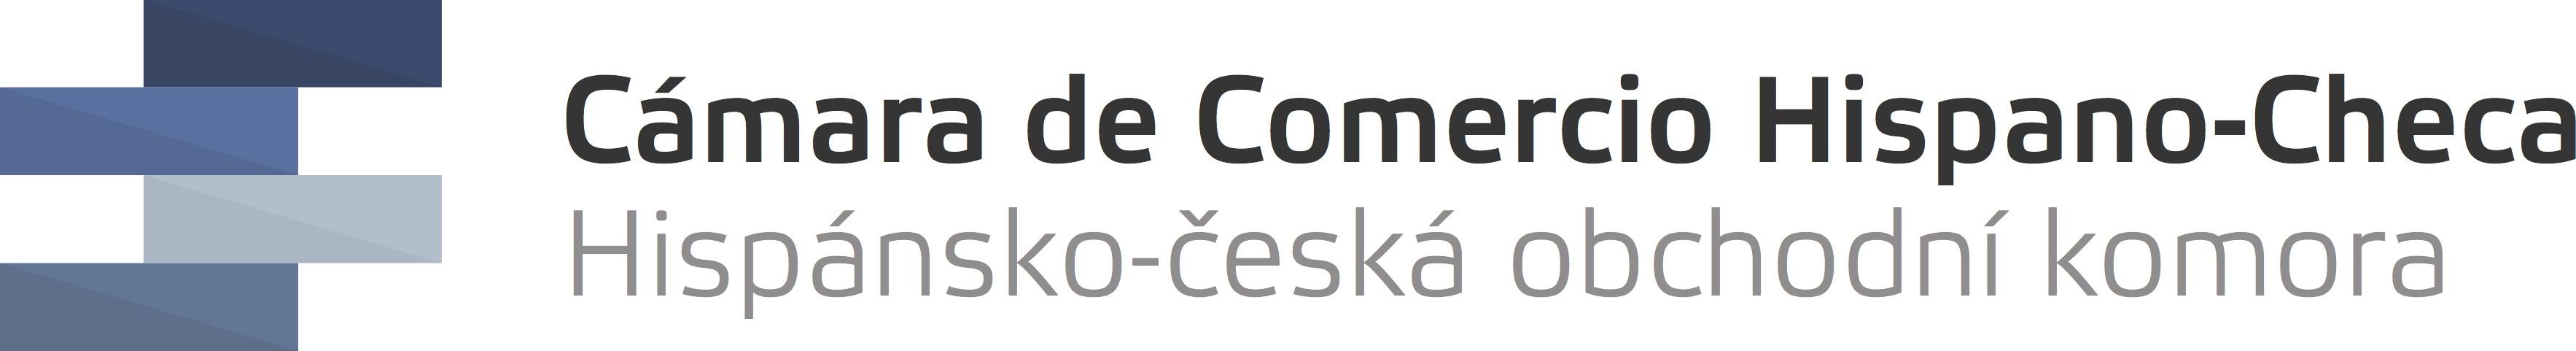 cchc-hcok-logo-rgb-vector